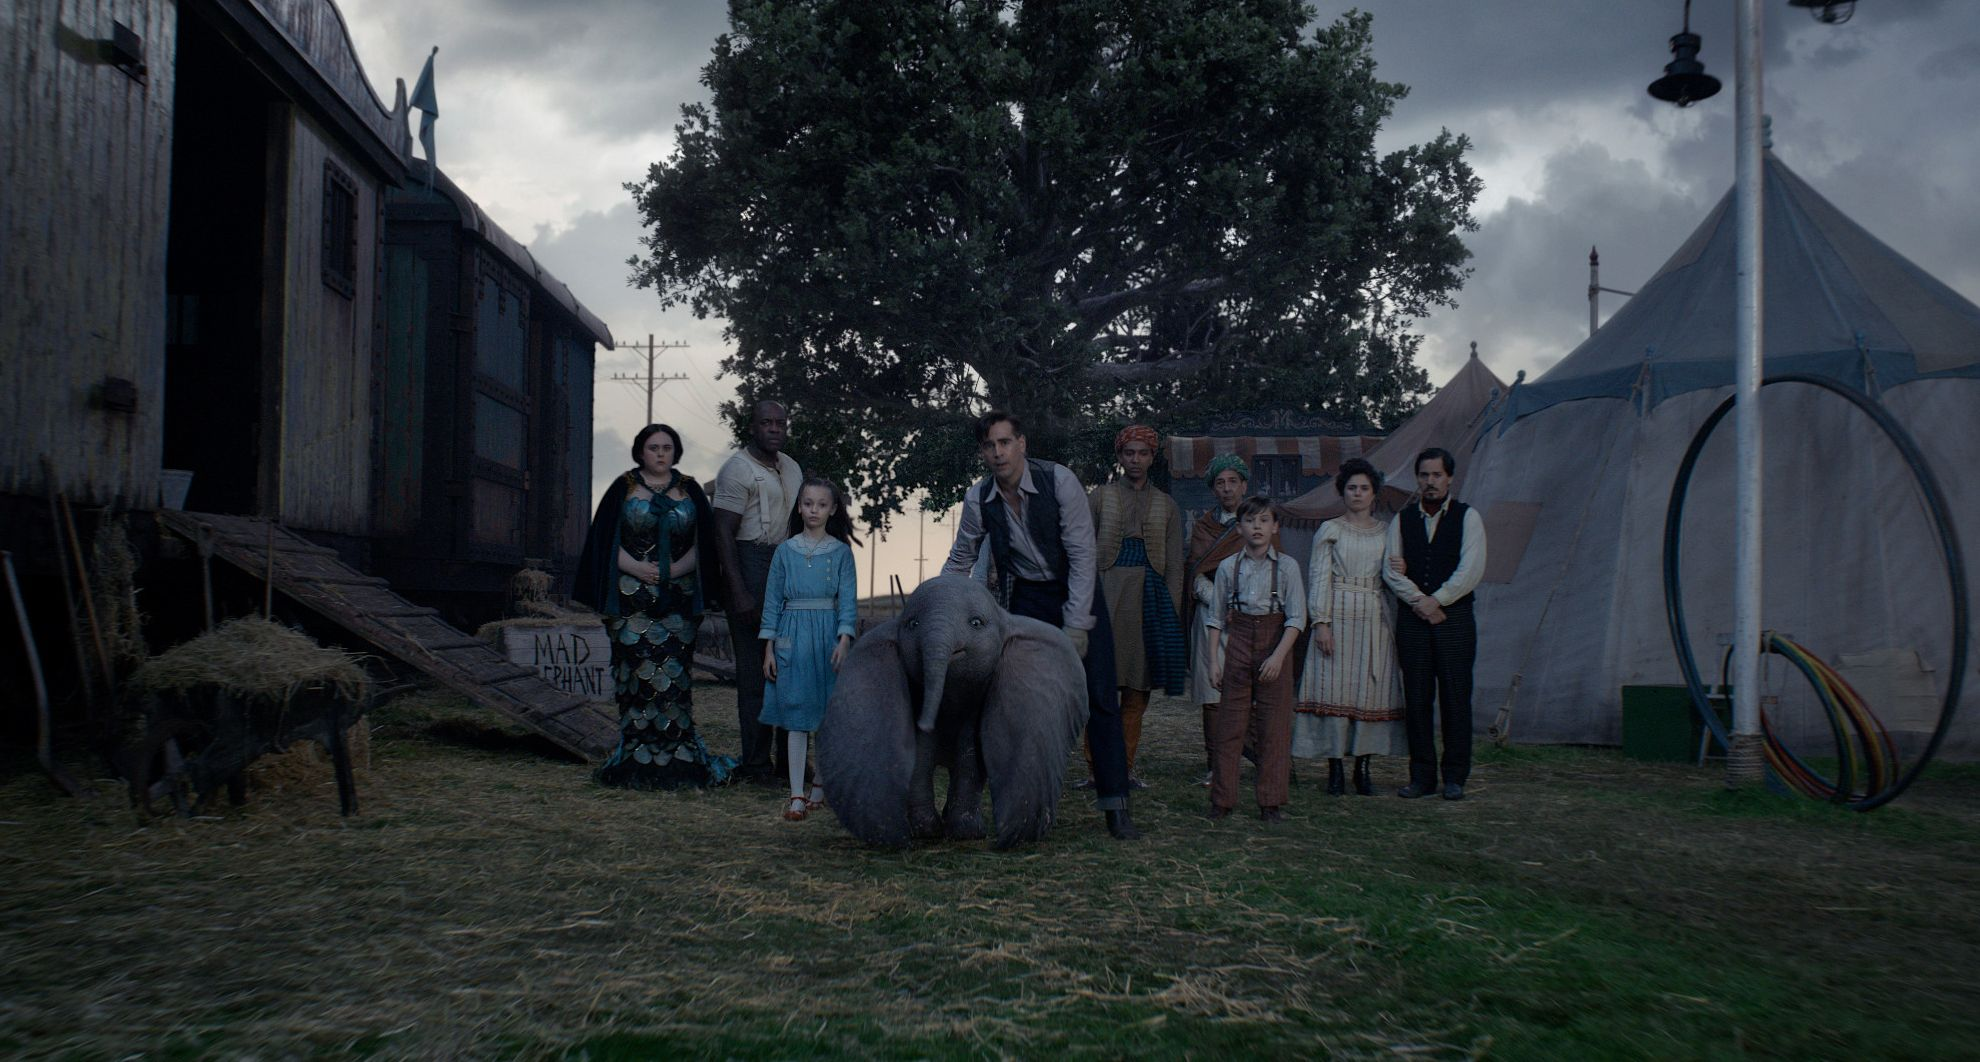 'Dumbo' Walt Disney Studios